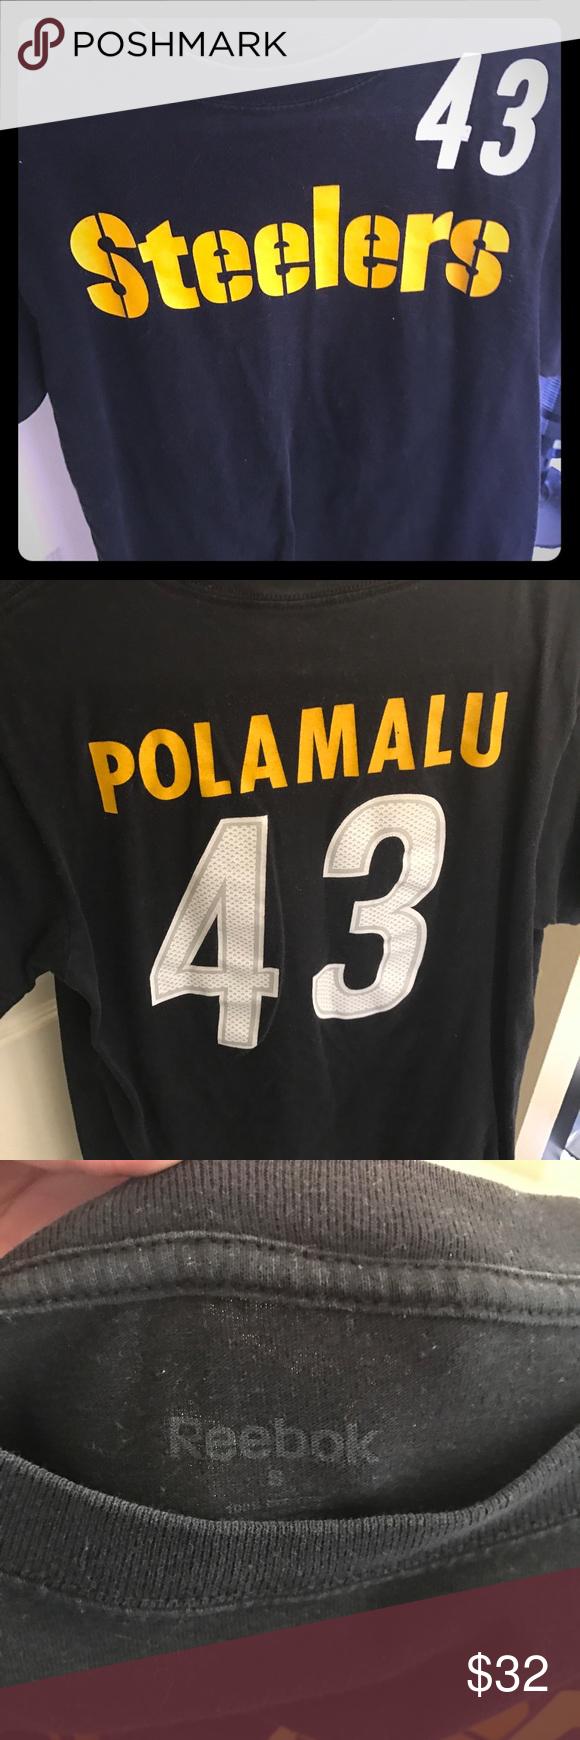 Steelers tee Small Reebok Tops Tees - Short Sleeve